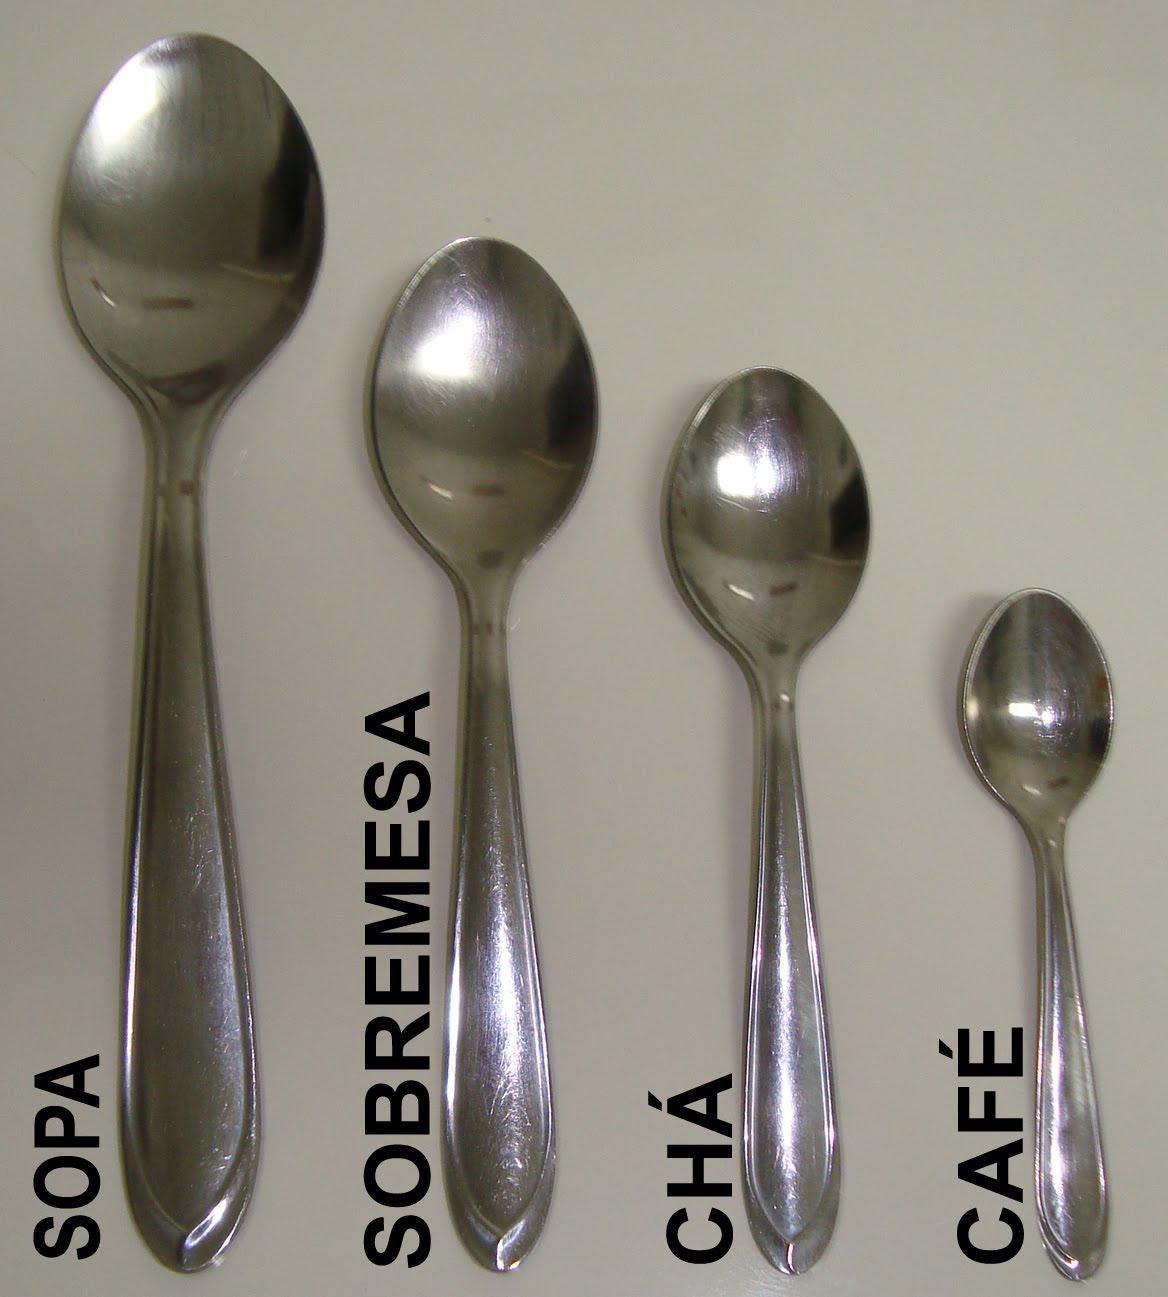 Temperos aromas tabela de convers o de medidas culin rias for 1 tablespoon vs teaspoon